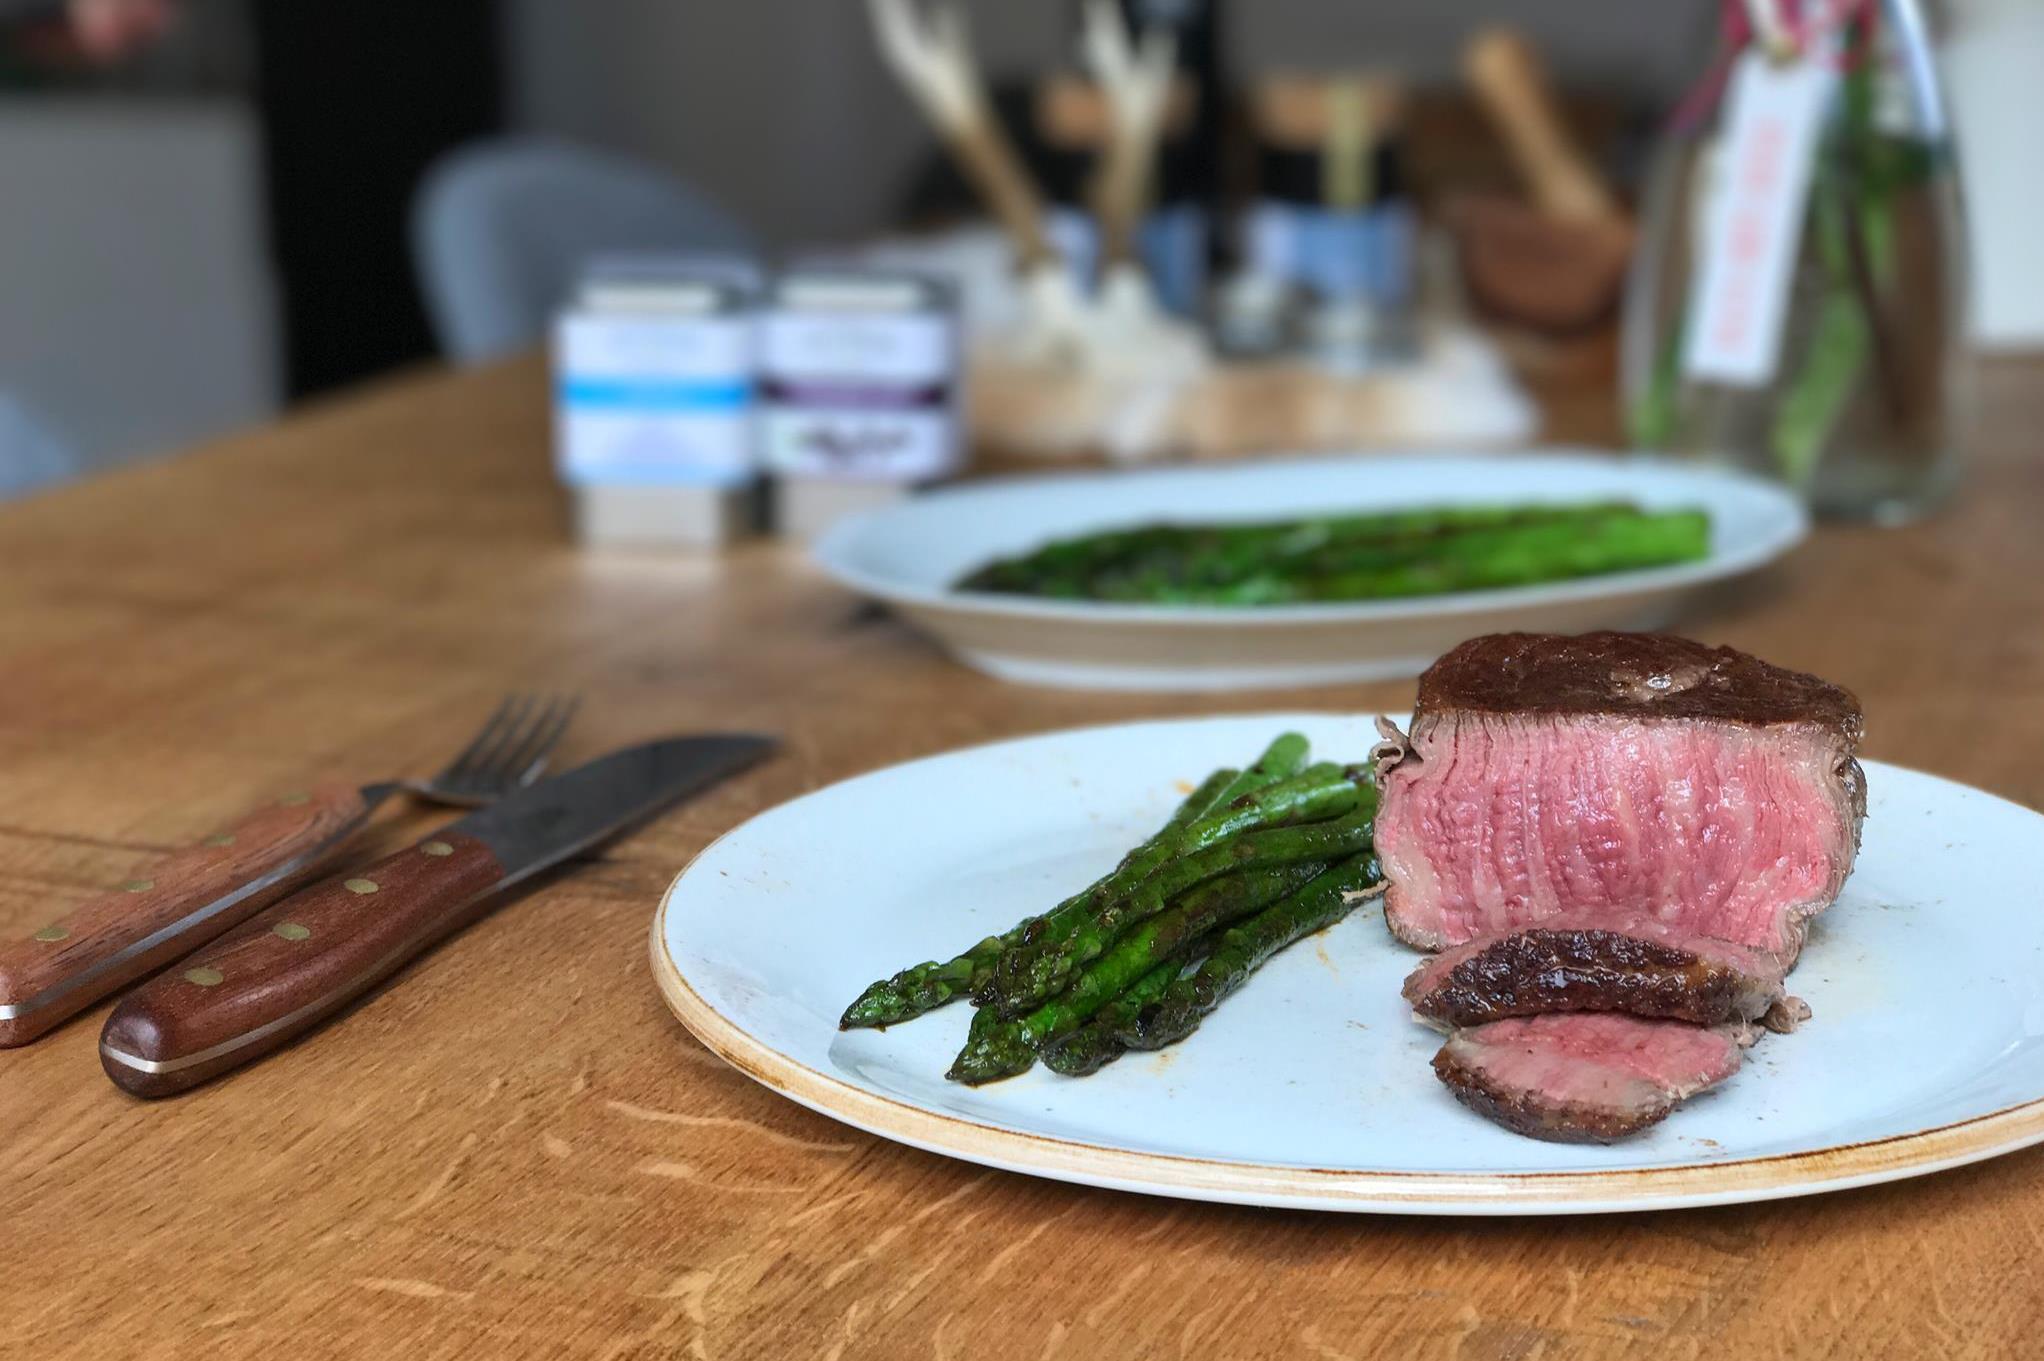 rezept f r cap of ribeye steak seltene steaks rezept von bigmeatlove. Black Bedroom Furniture Sets. Home Design Ideas